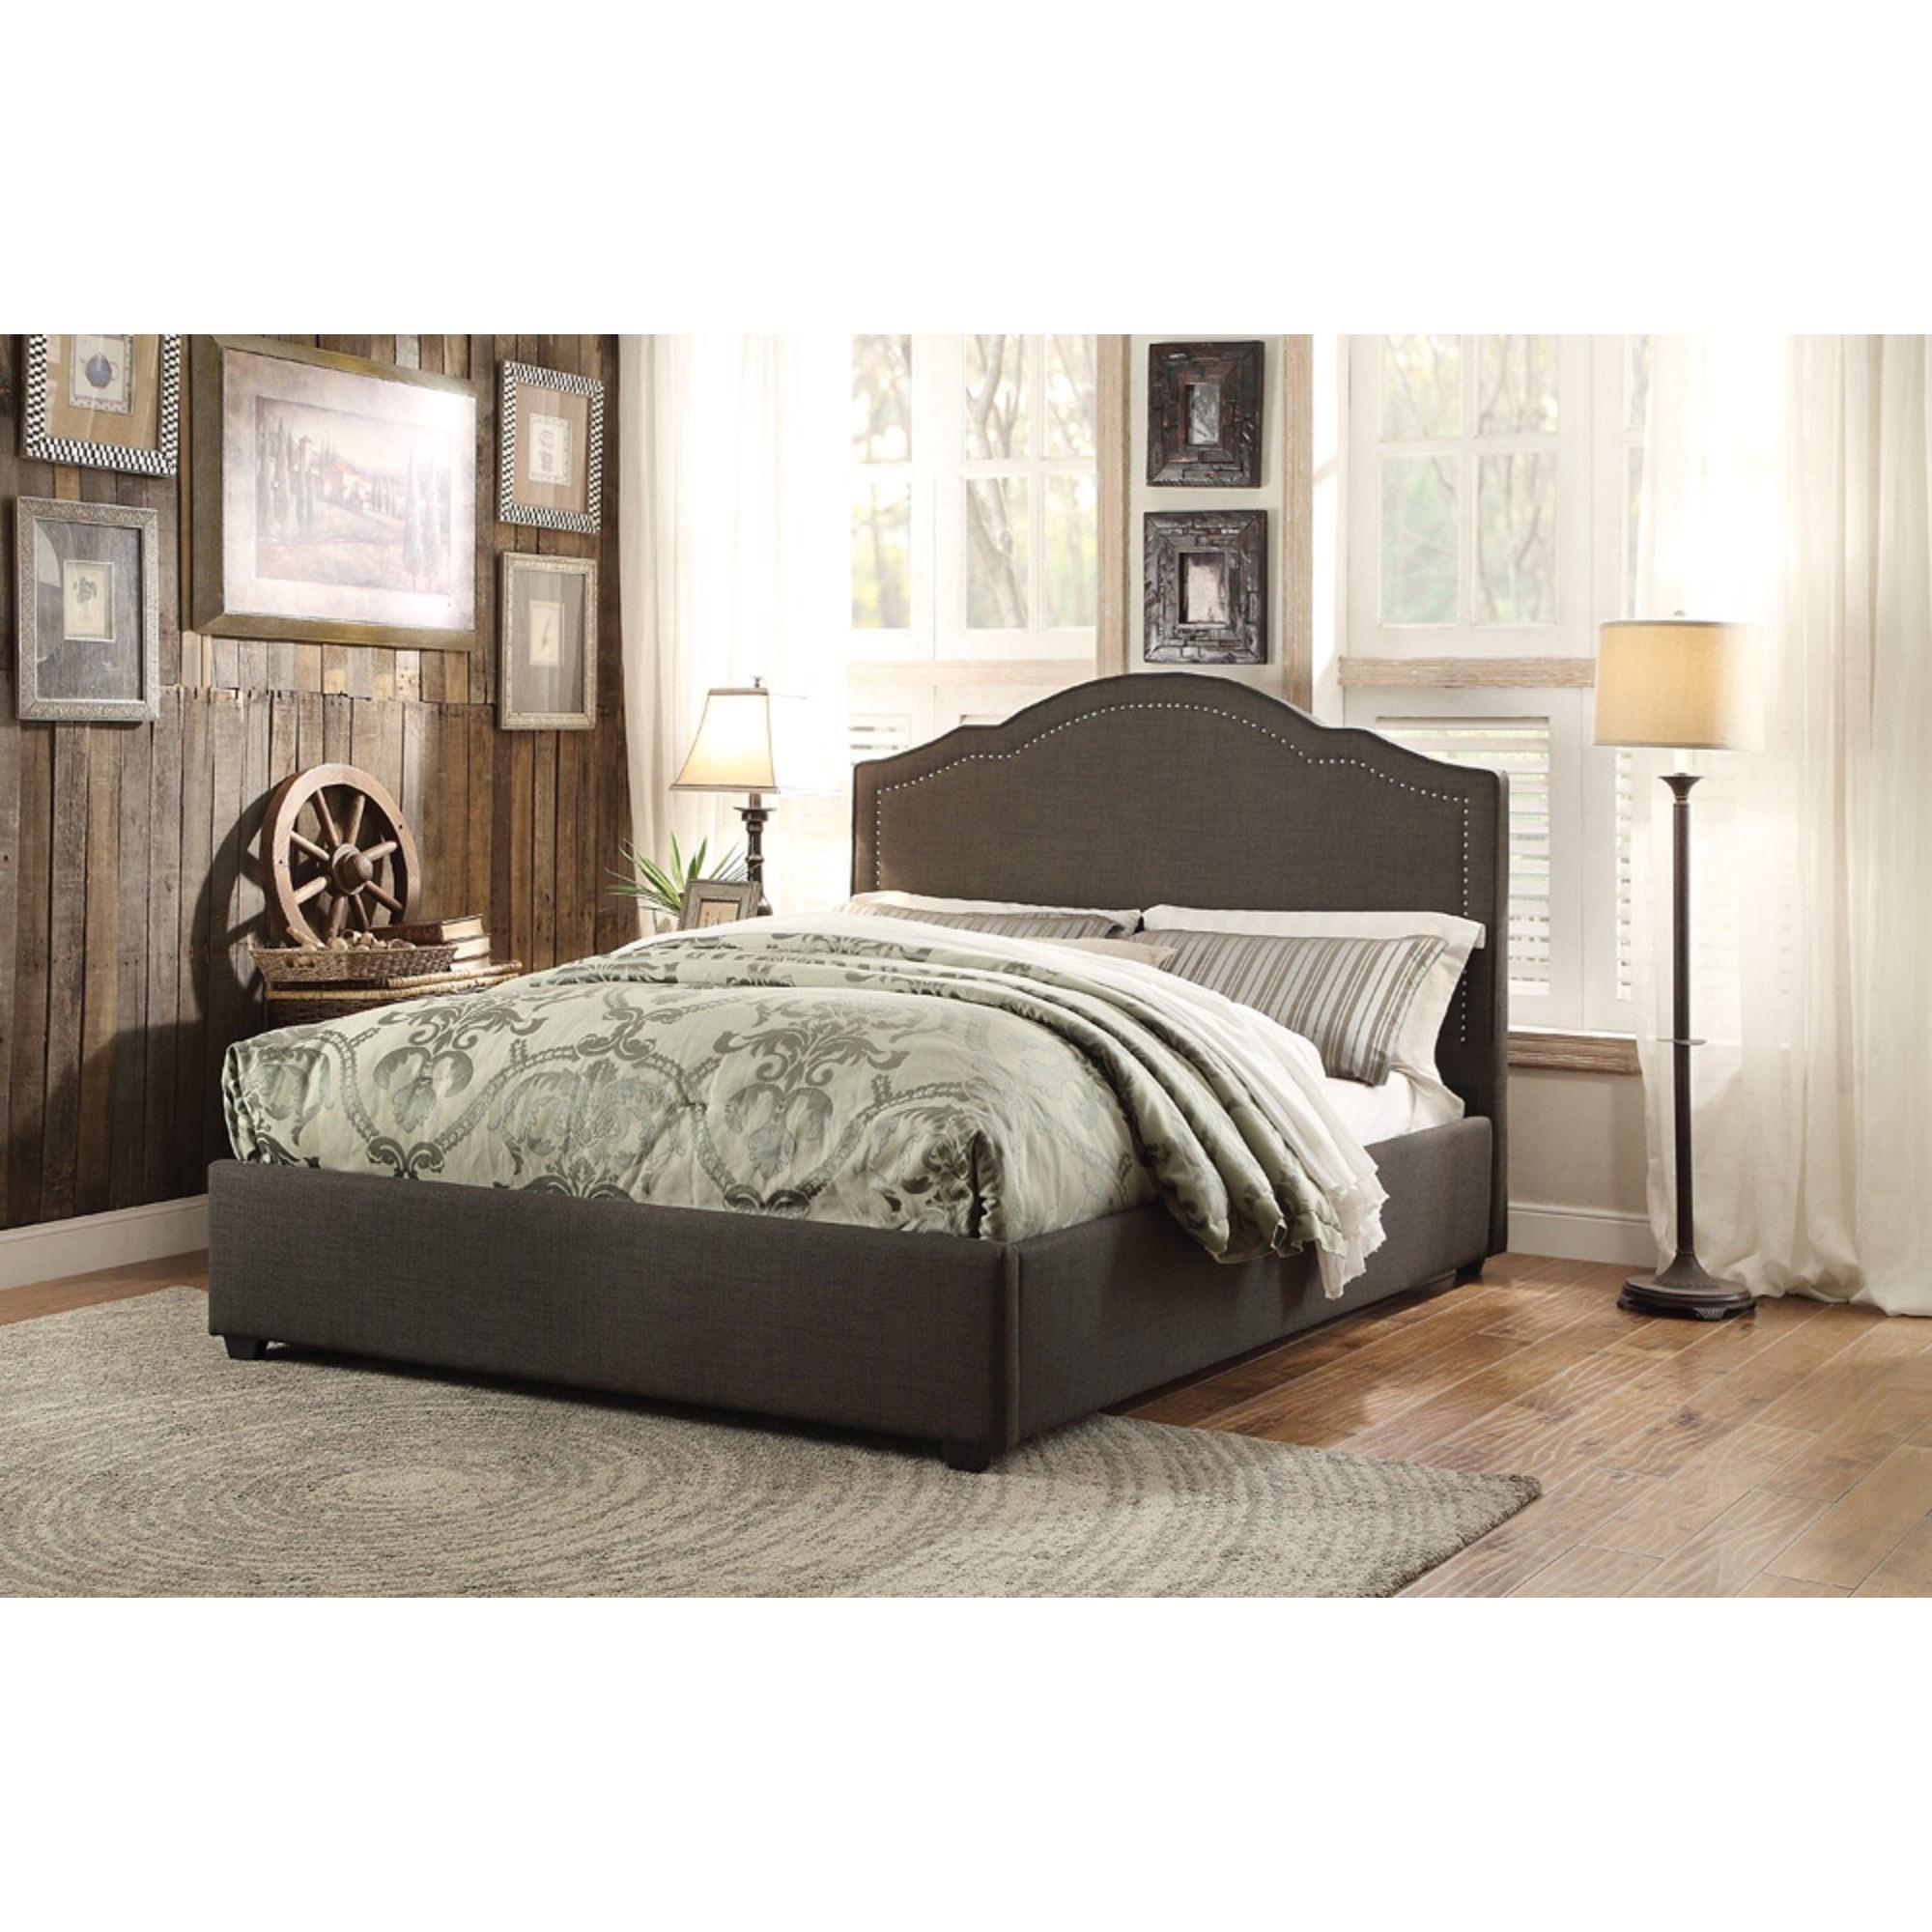 Homelegance Zaira Queen Upholstered Bed - Item Number: 1885N-1+2+3